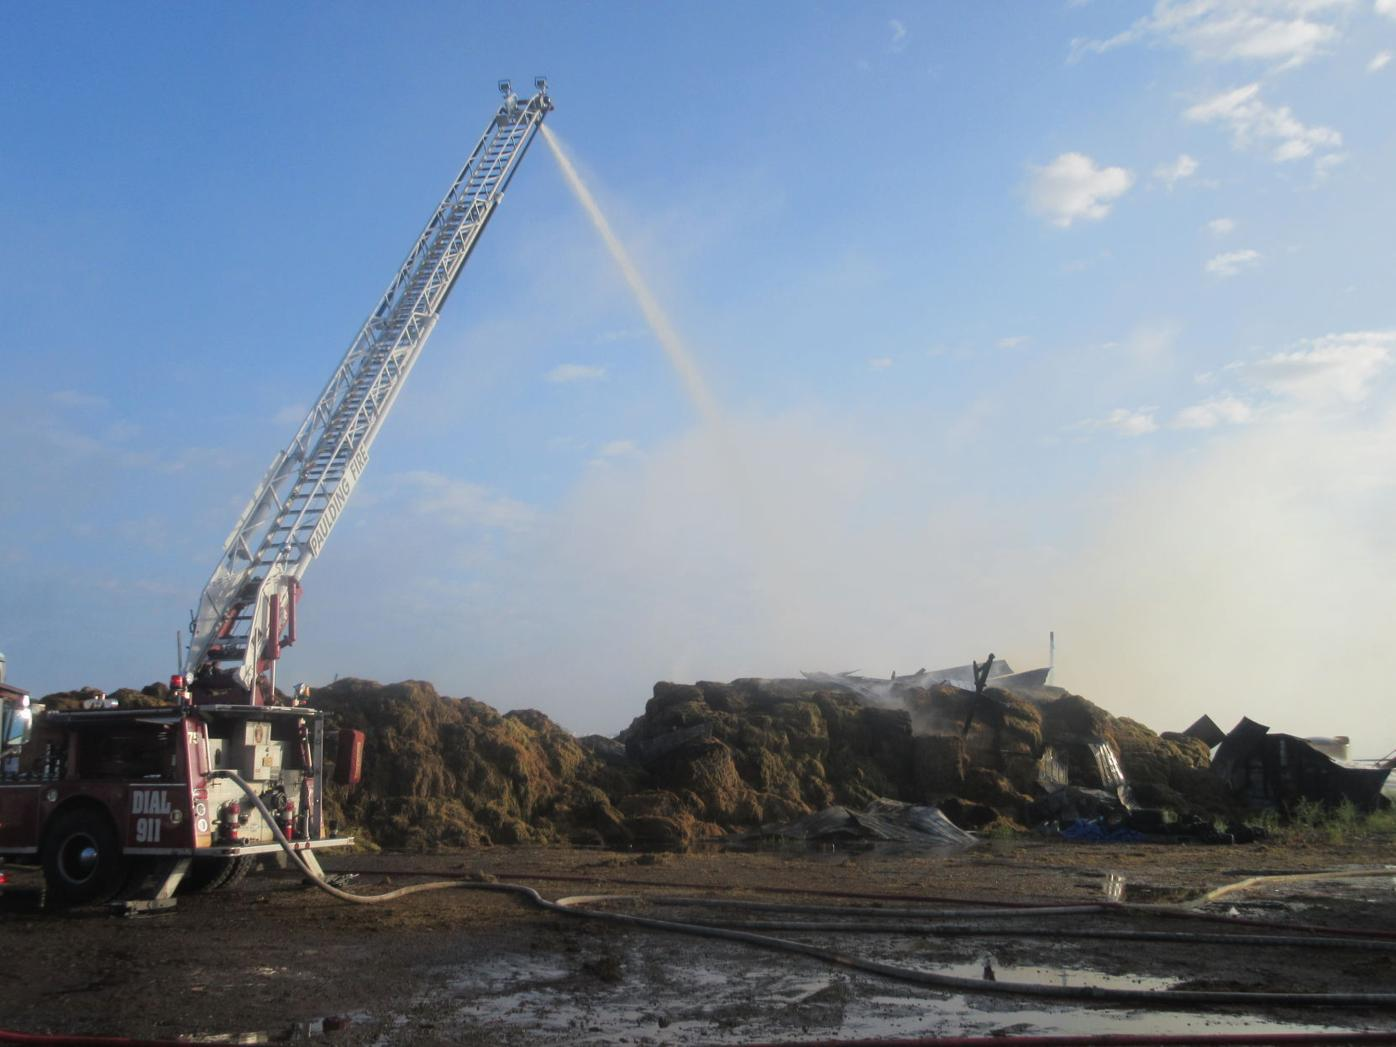 paulding county fire1 photo